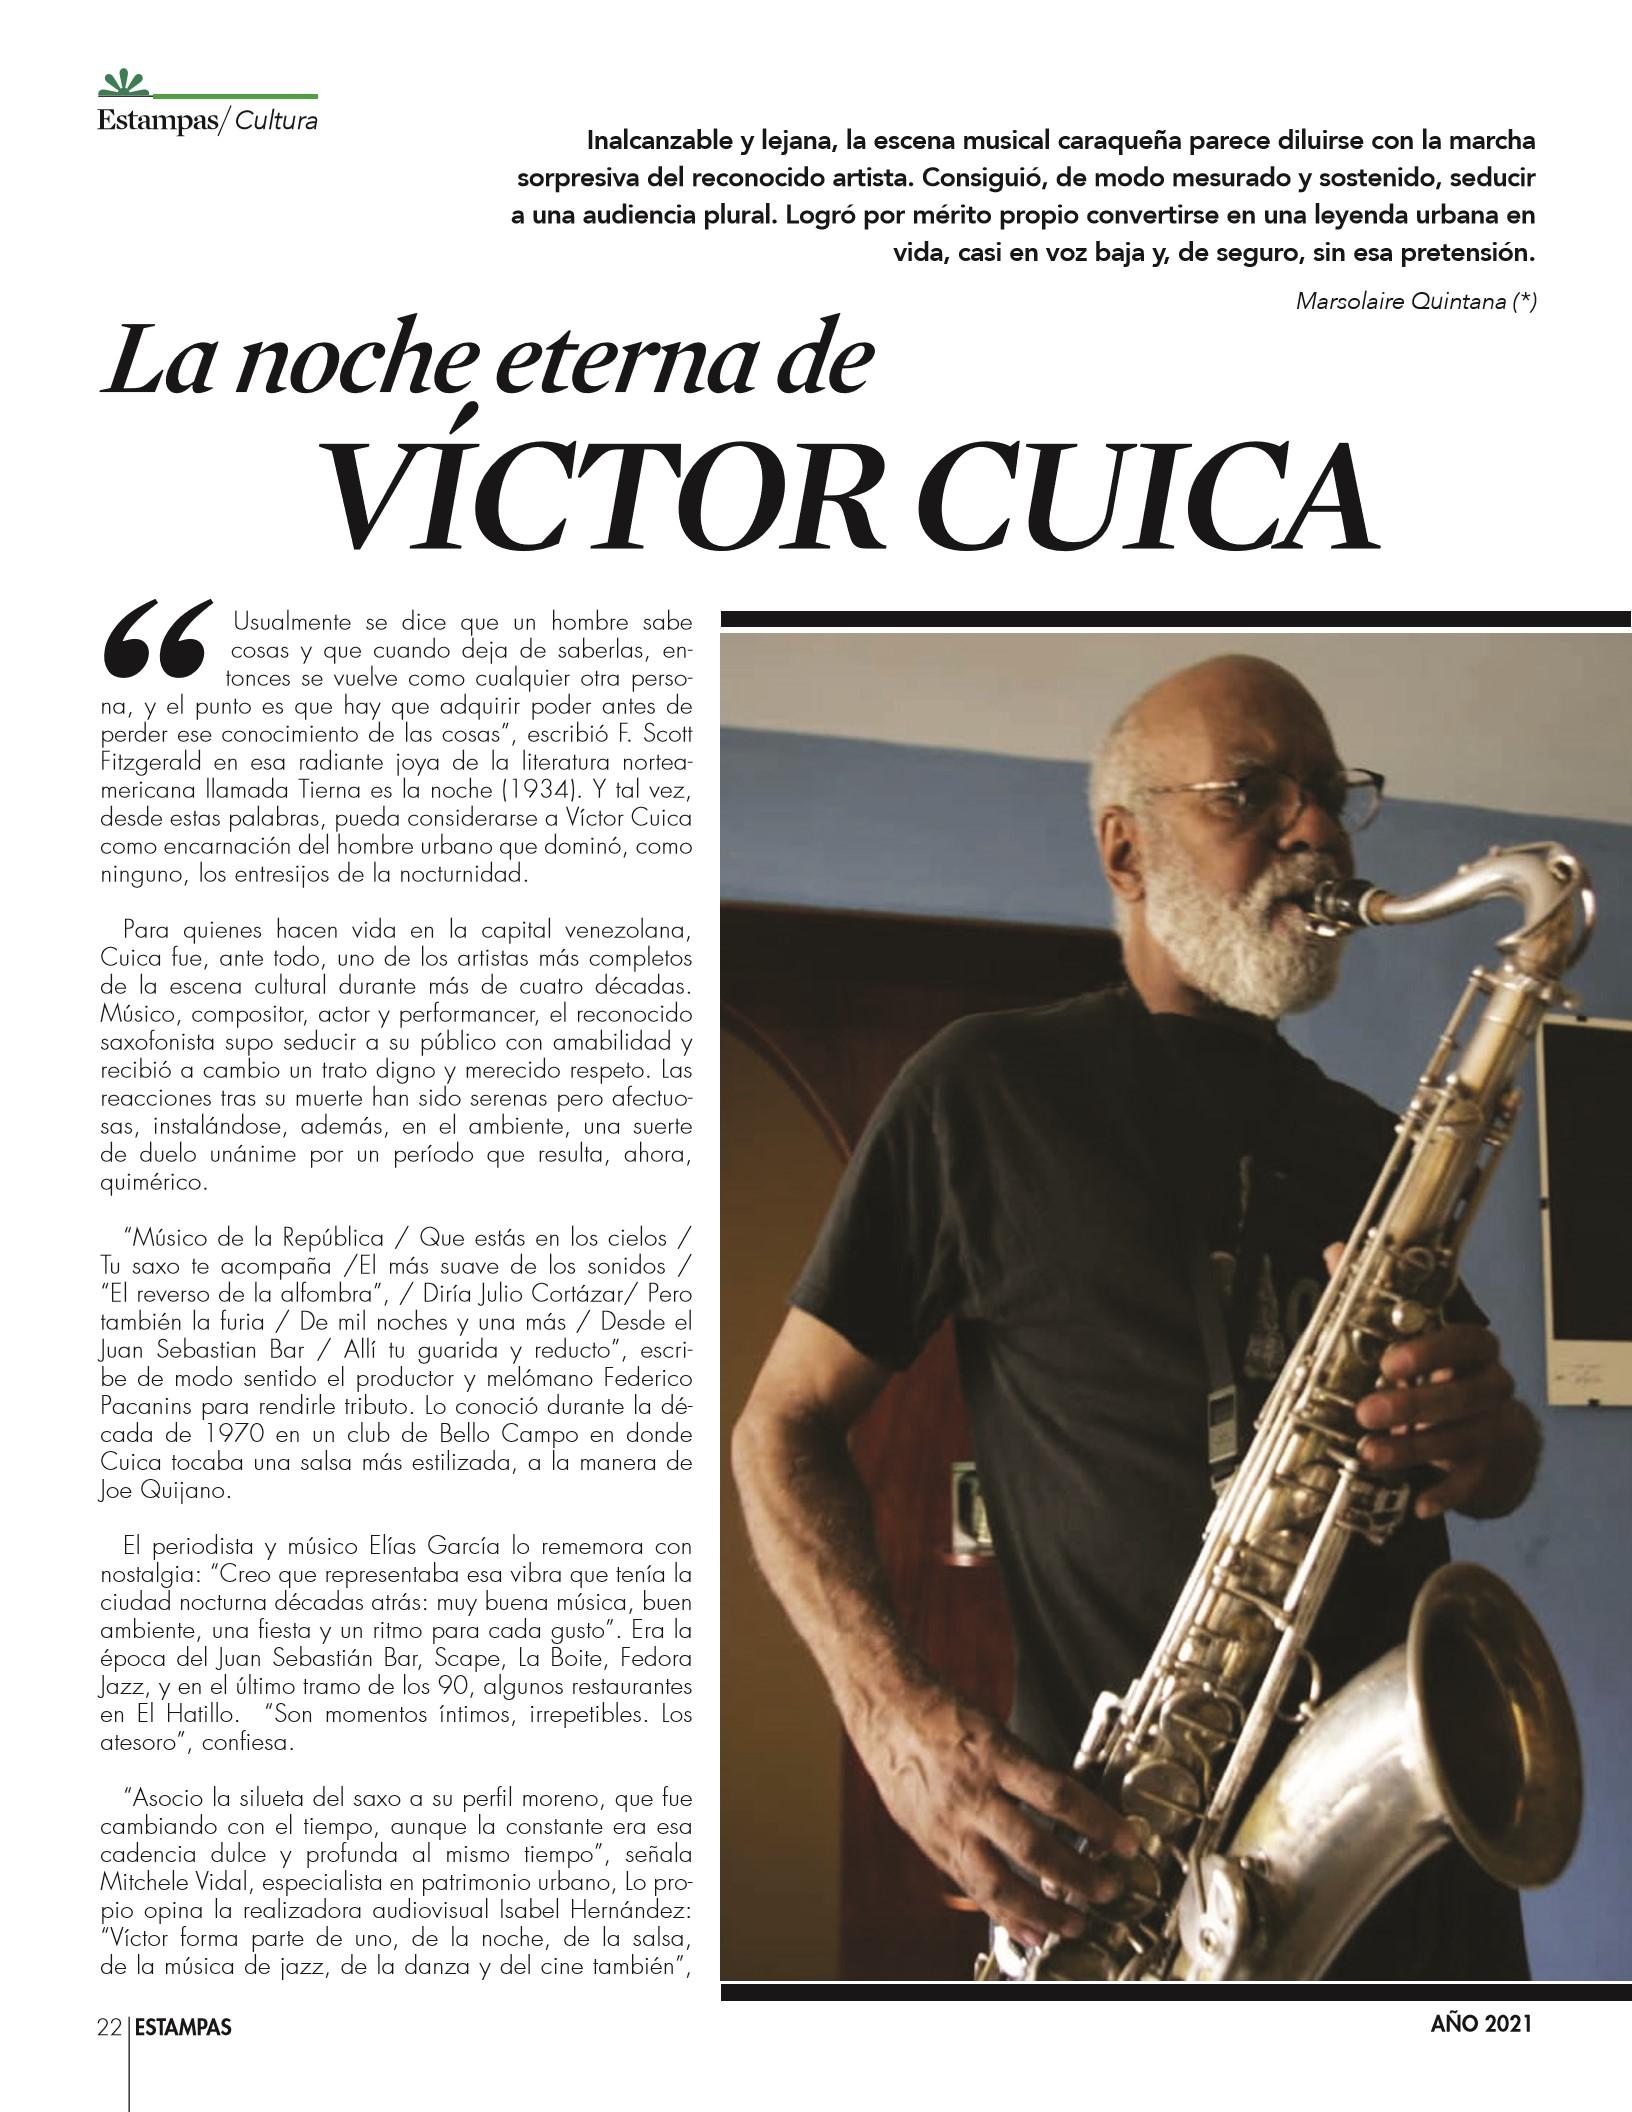 22-REV Cultura: Marsolaire Quintana - La noche eterna de Víctor Cuica